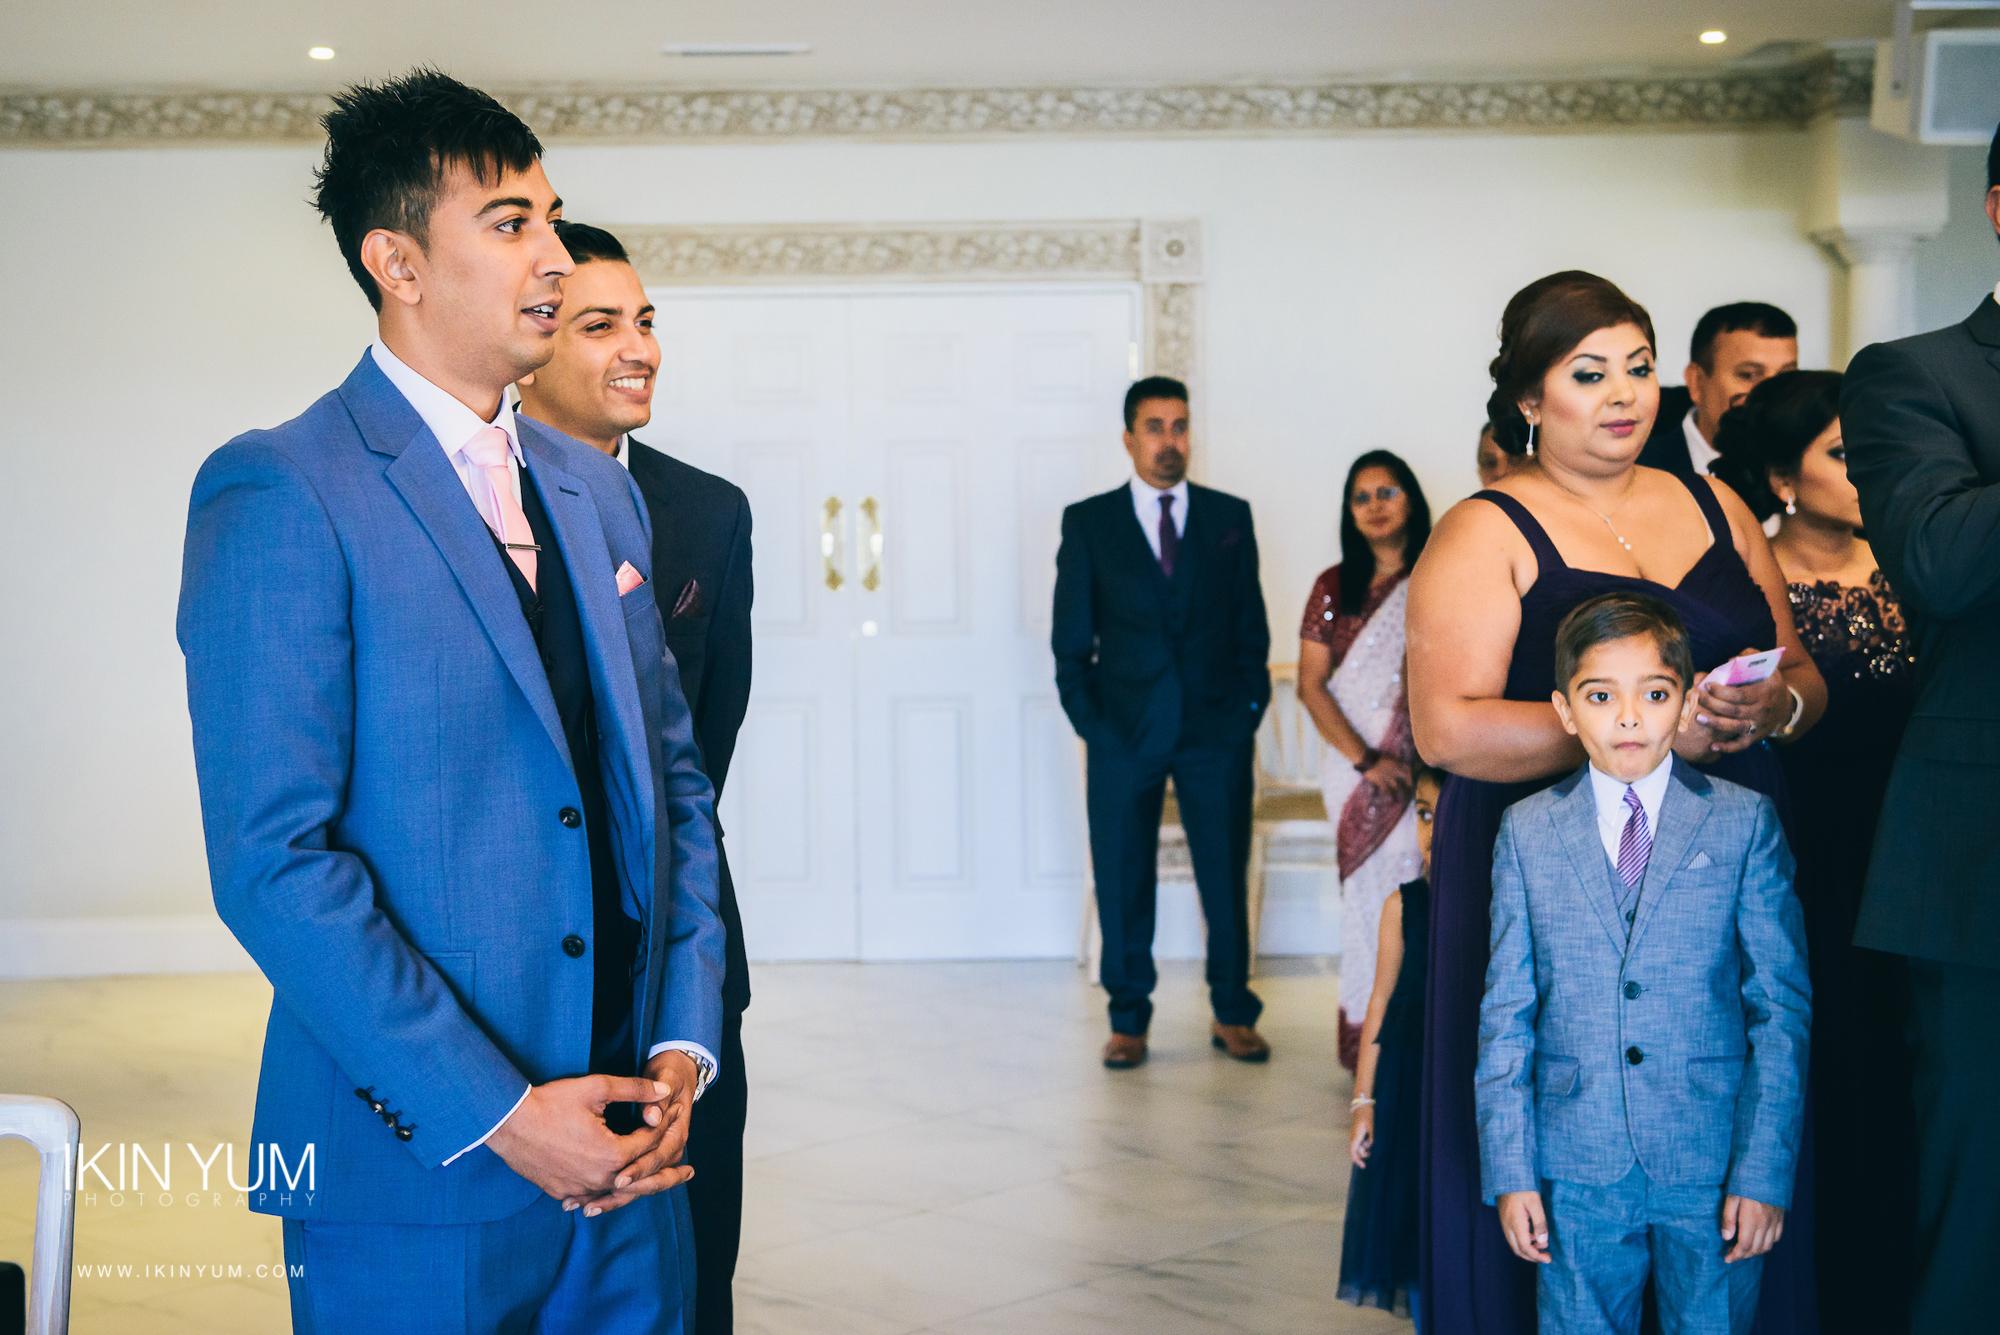 Froyle Park Indian Wedding - Ikin Yum Photography-046.jpg